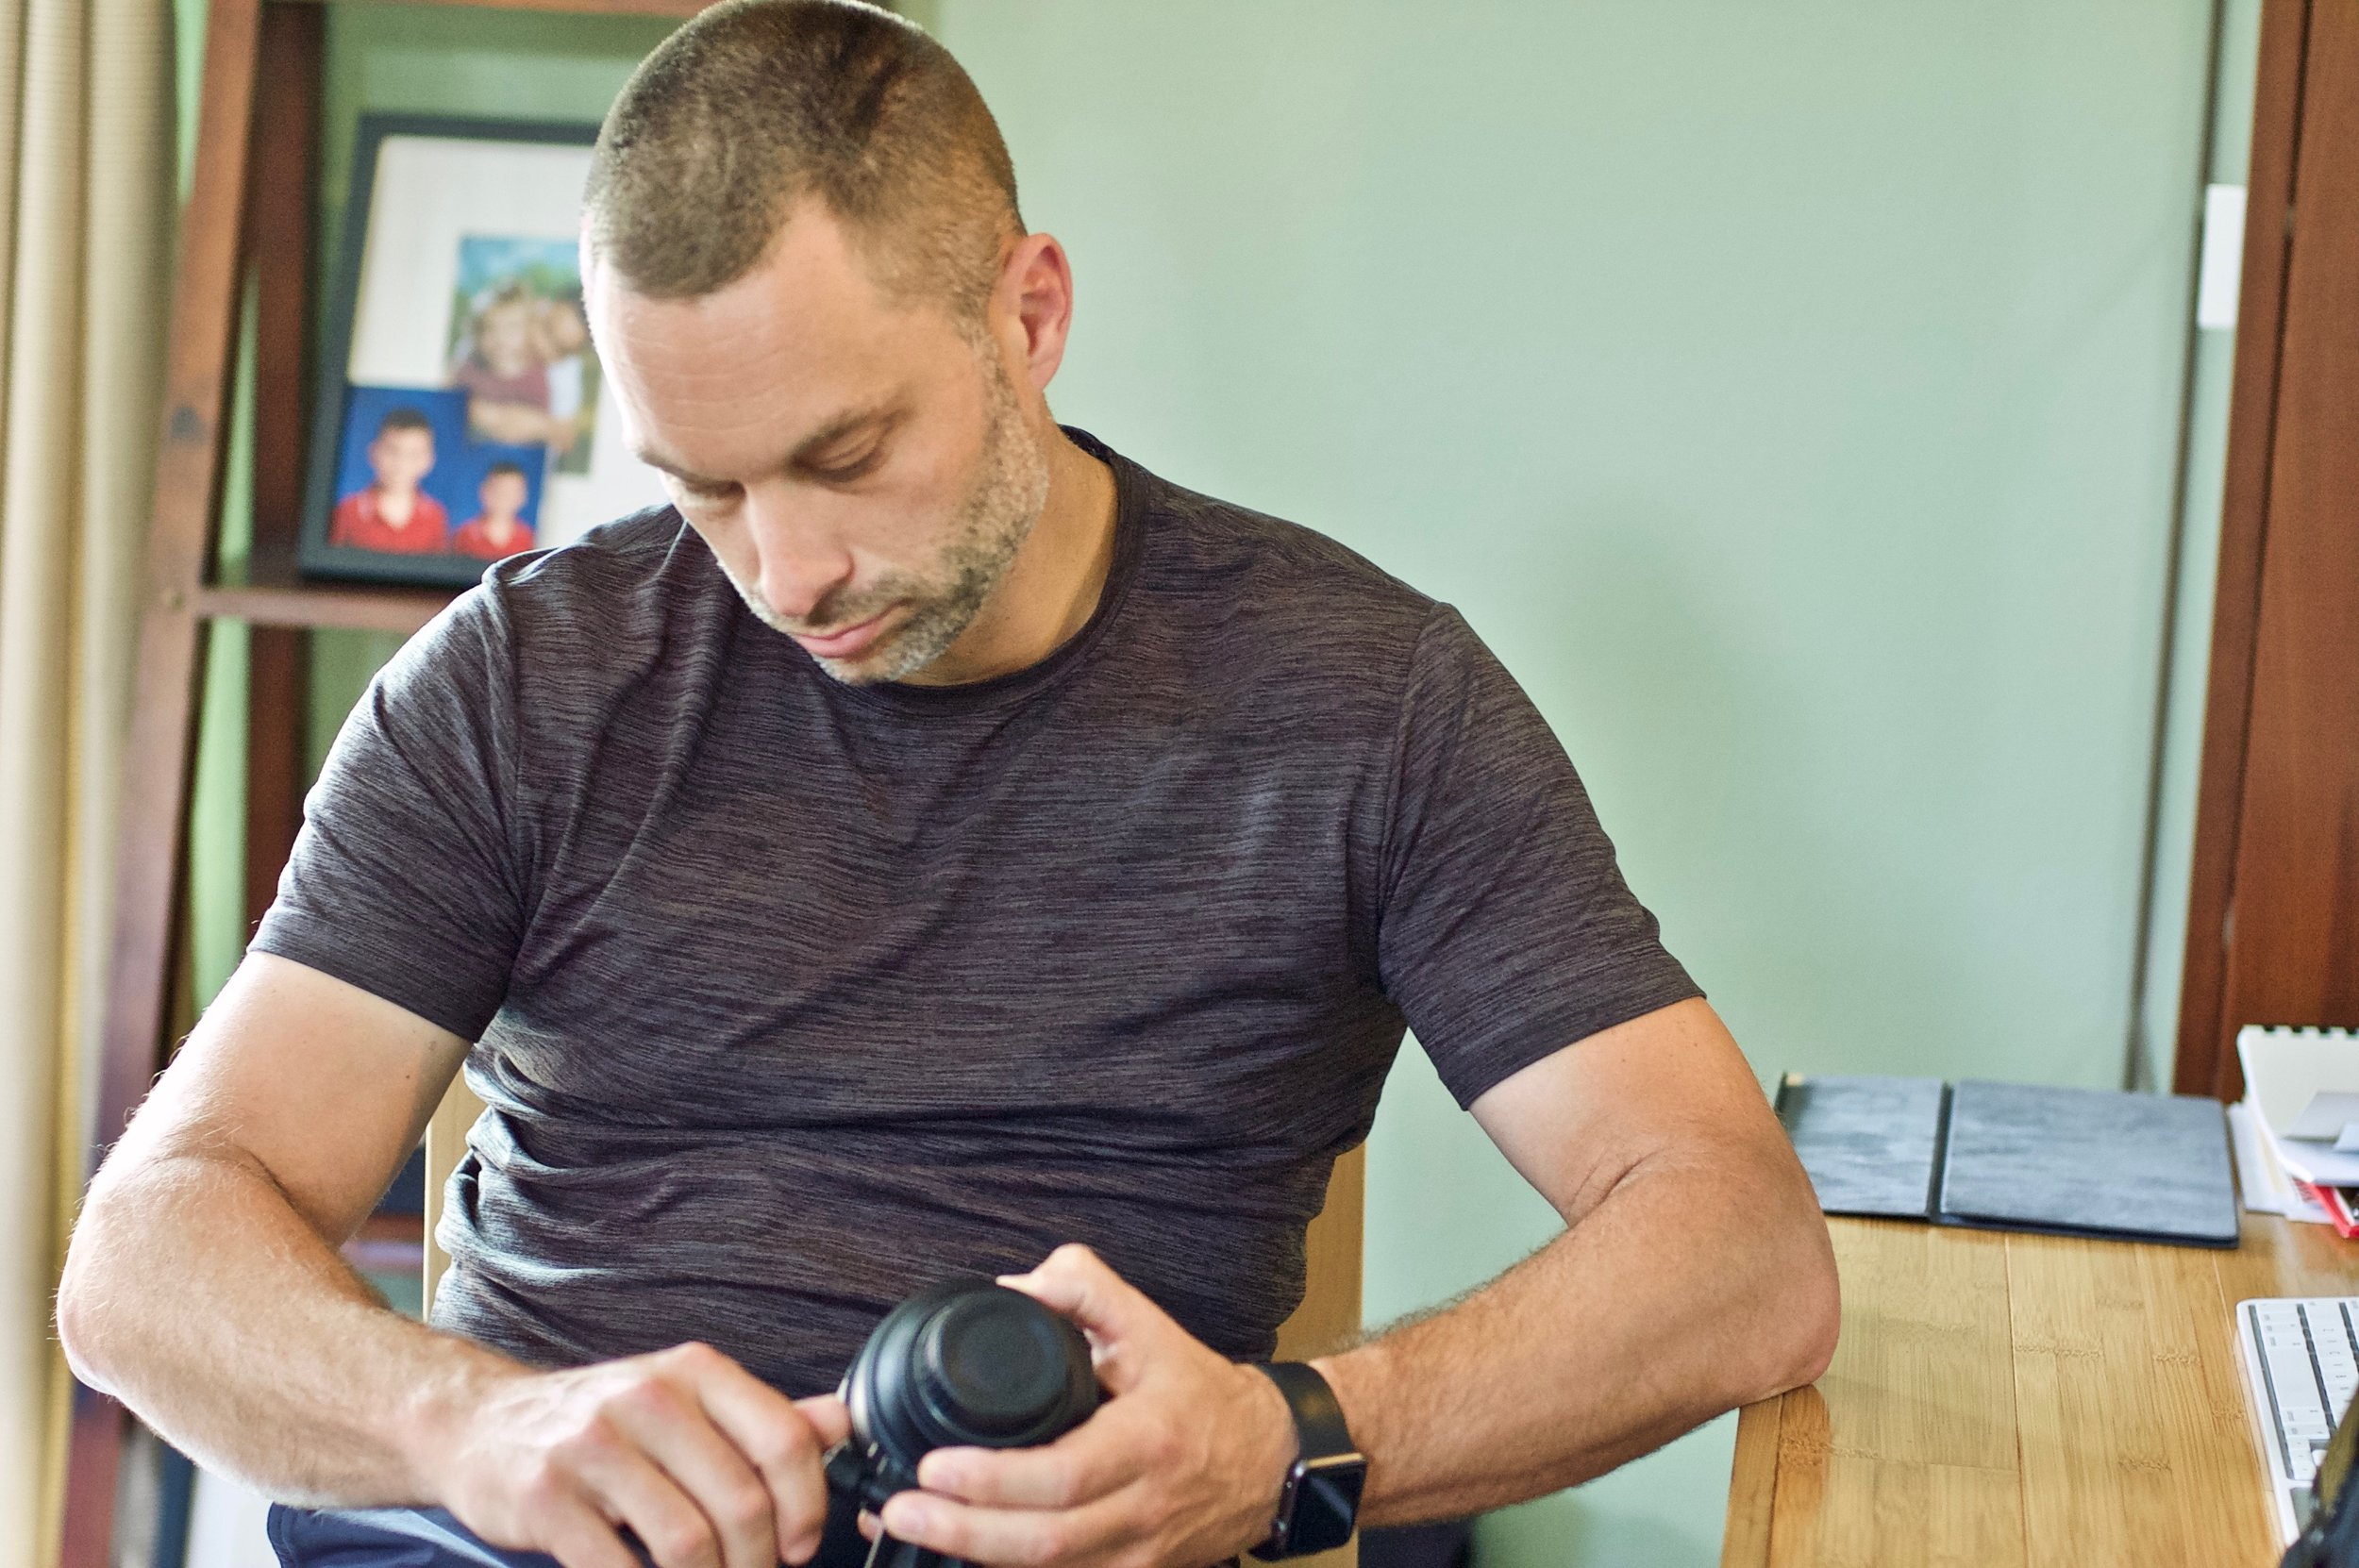 G's shot of dad changing lenses